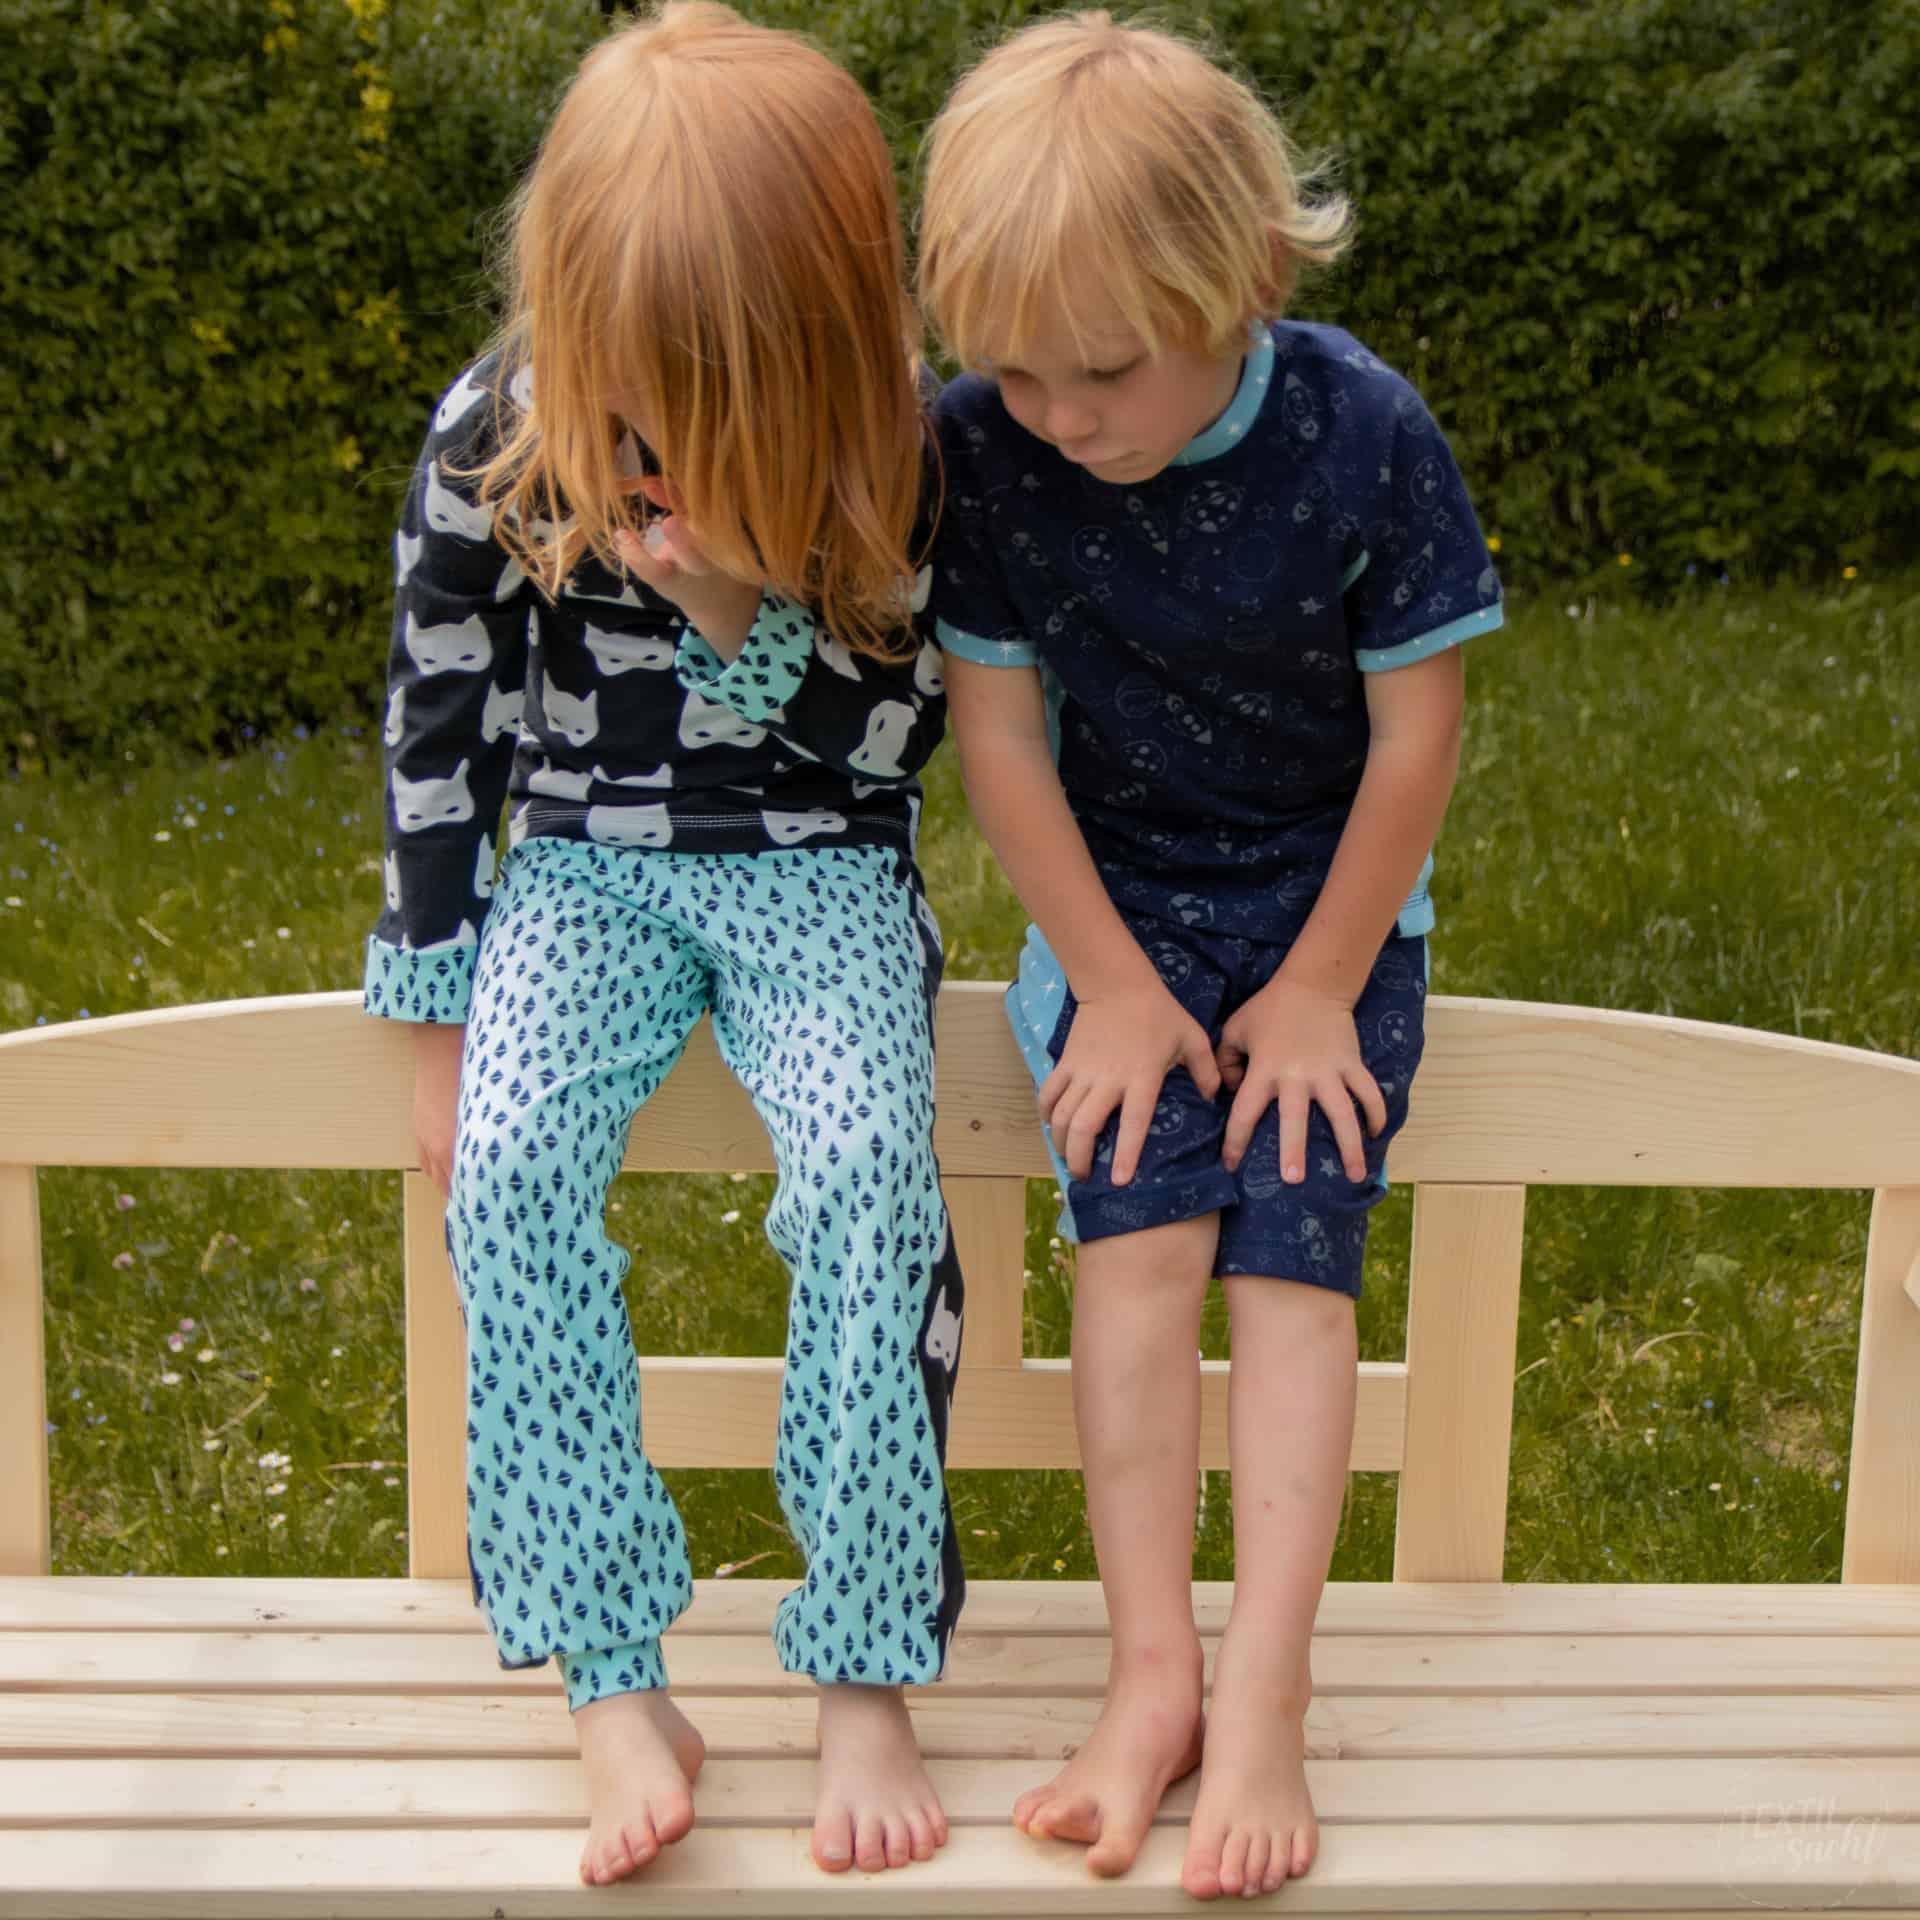 Kind kostenlos top schnittmuster Tolle kostenlose